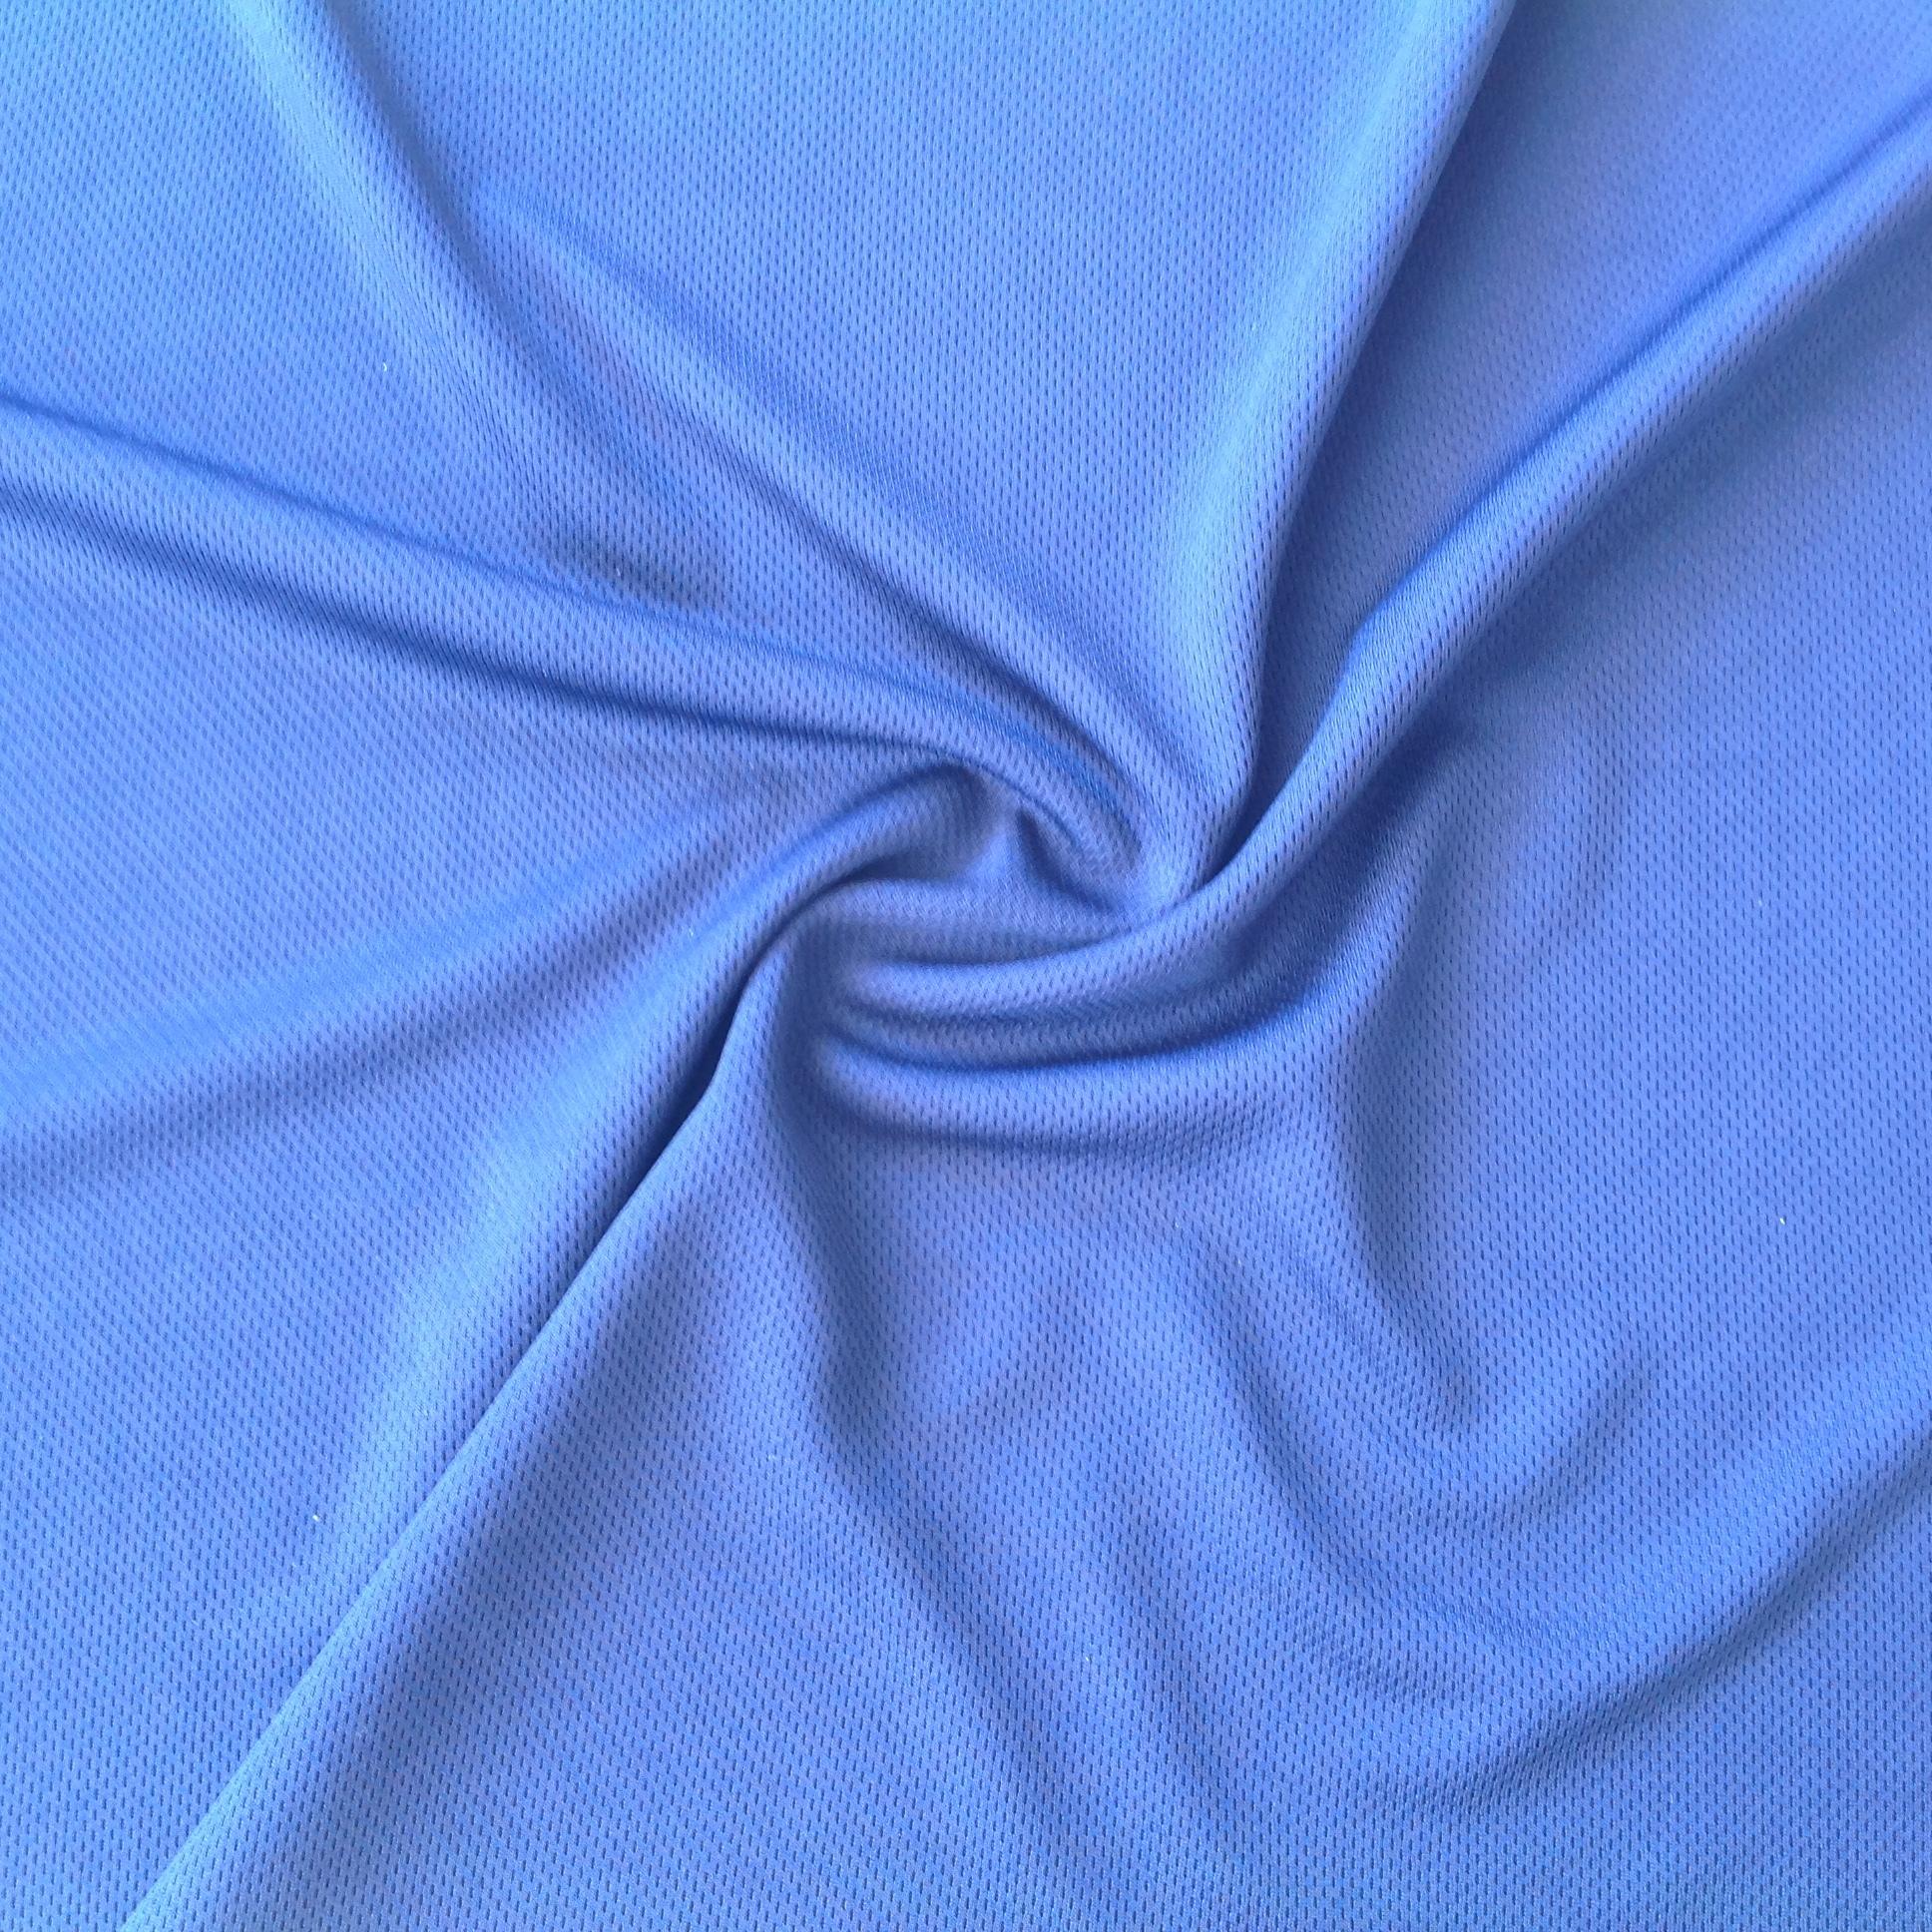 Eyelet Knitted Mesh Knit Interlock Fabrics